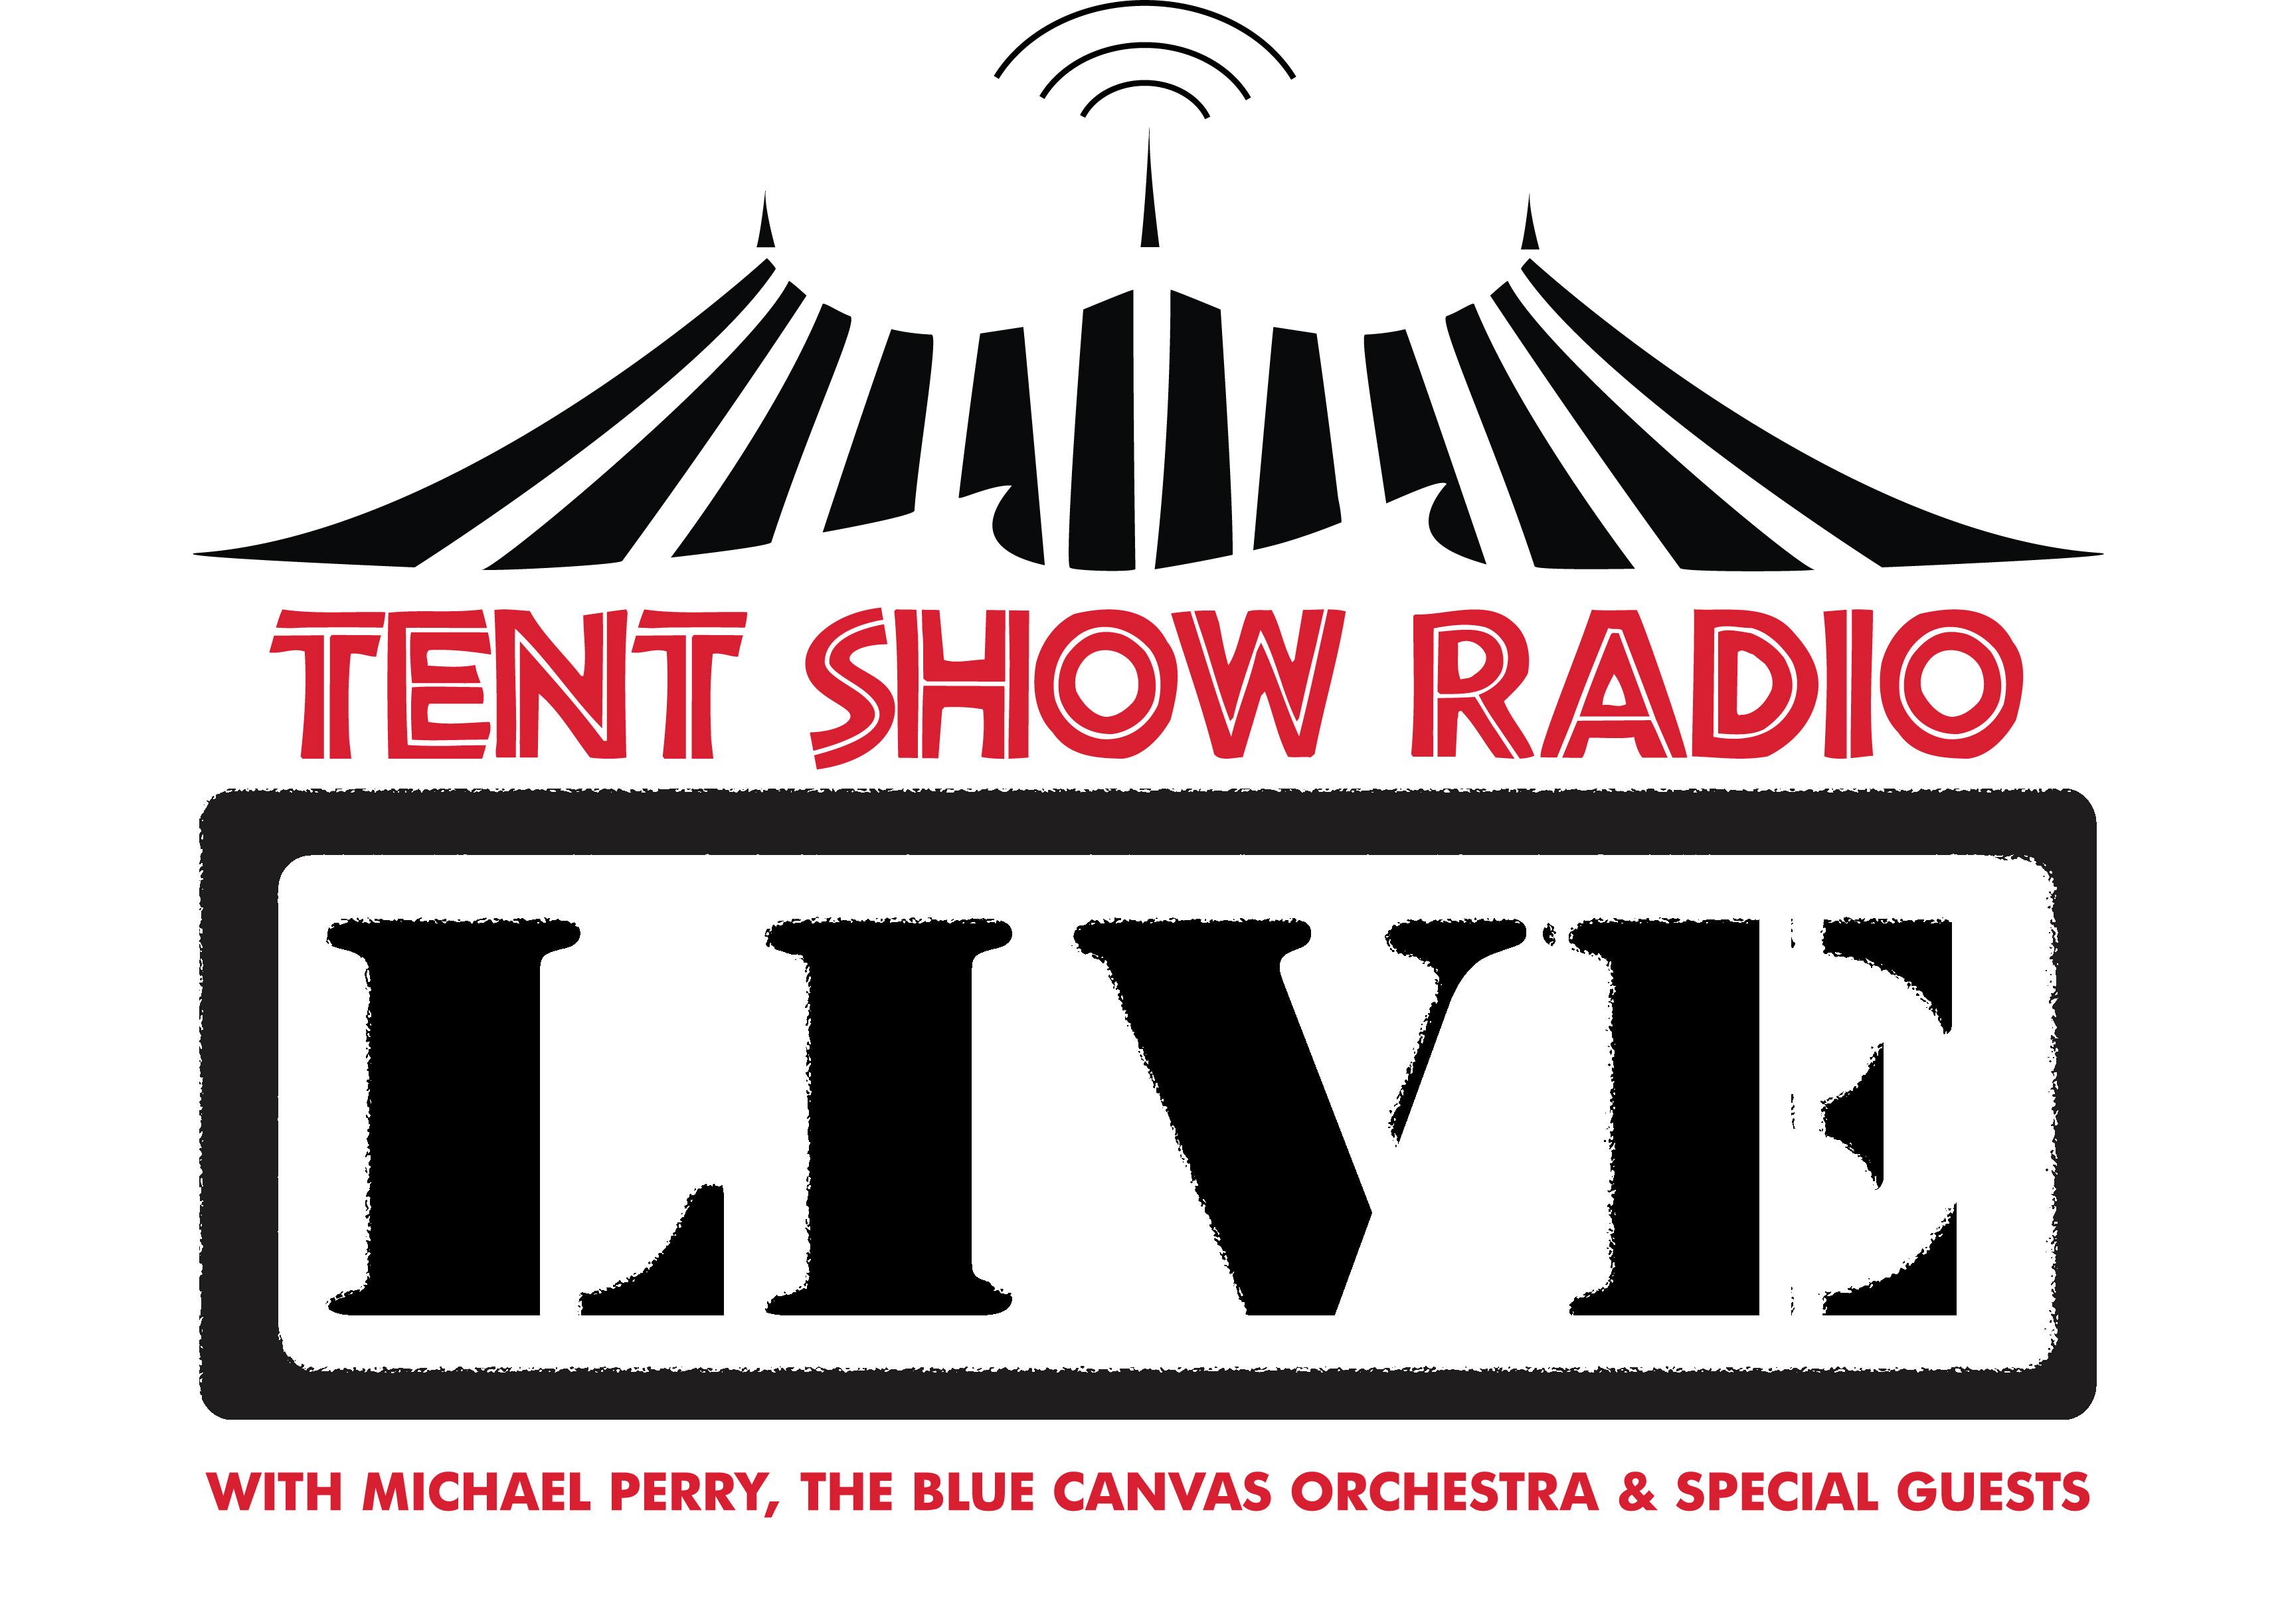 Tent Show Radio LIVE on tour!